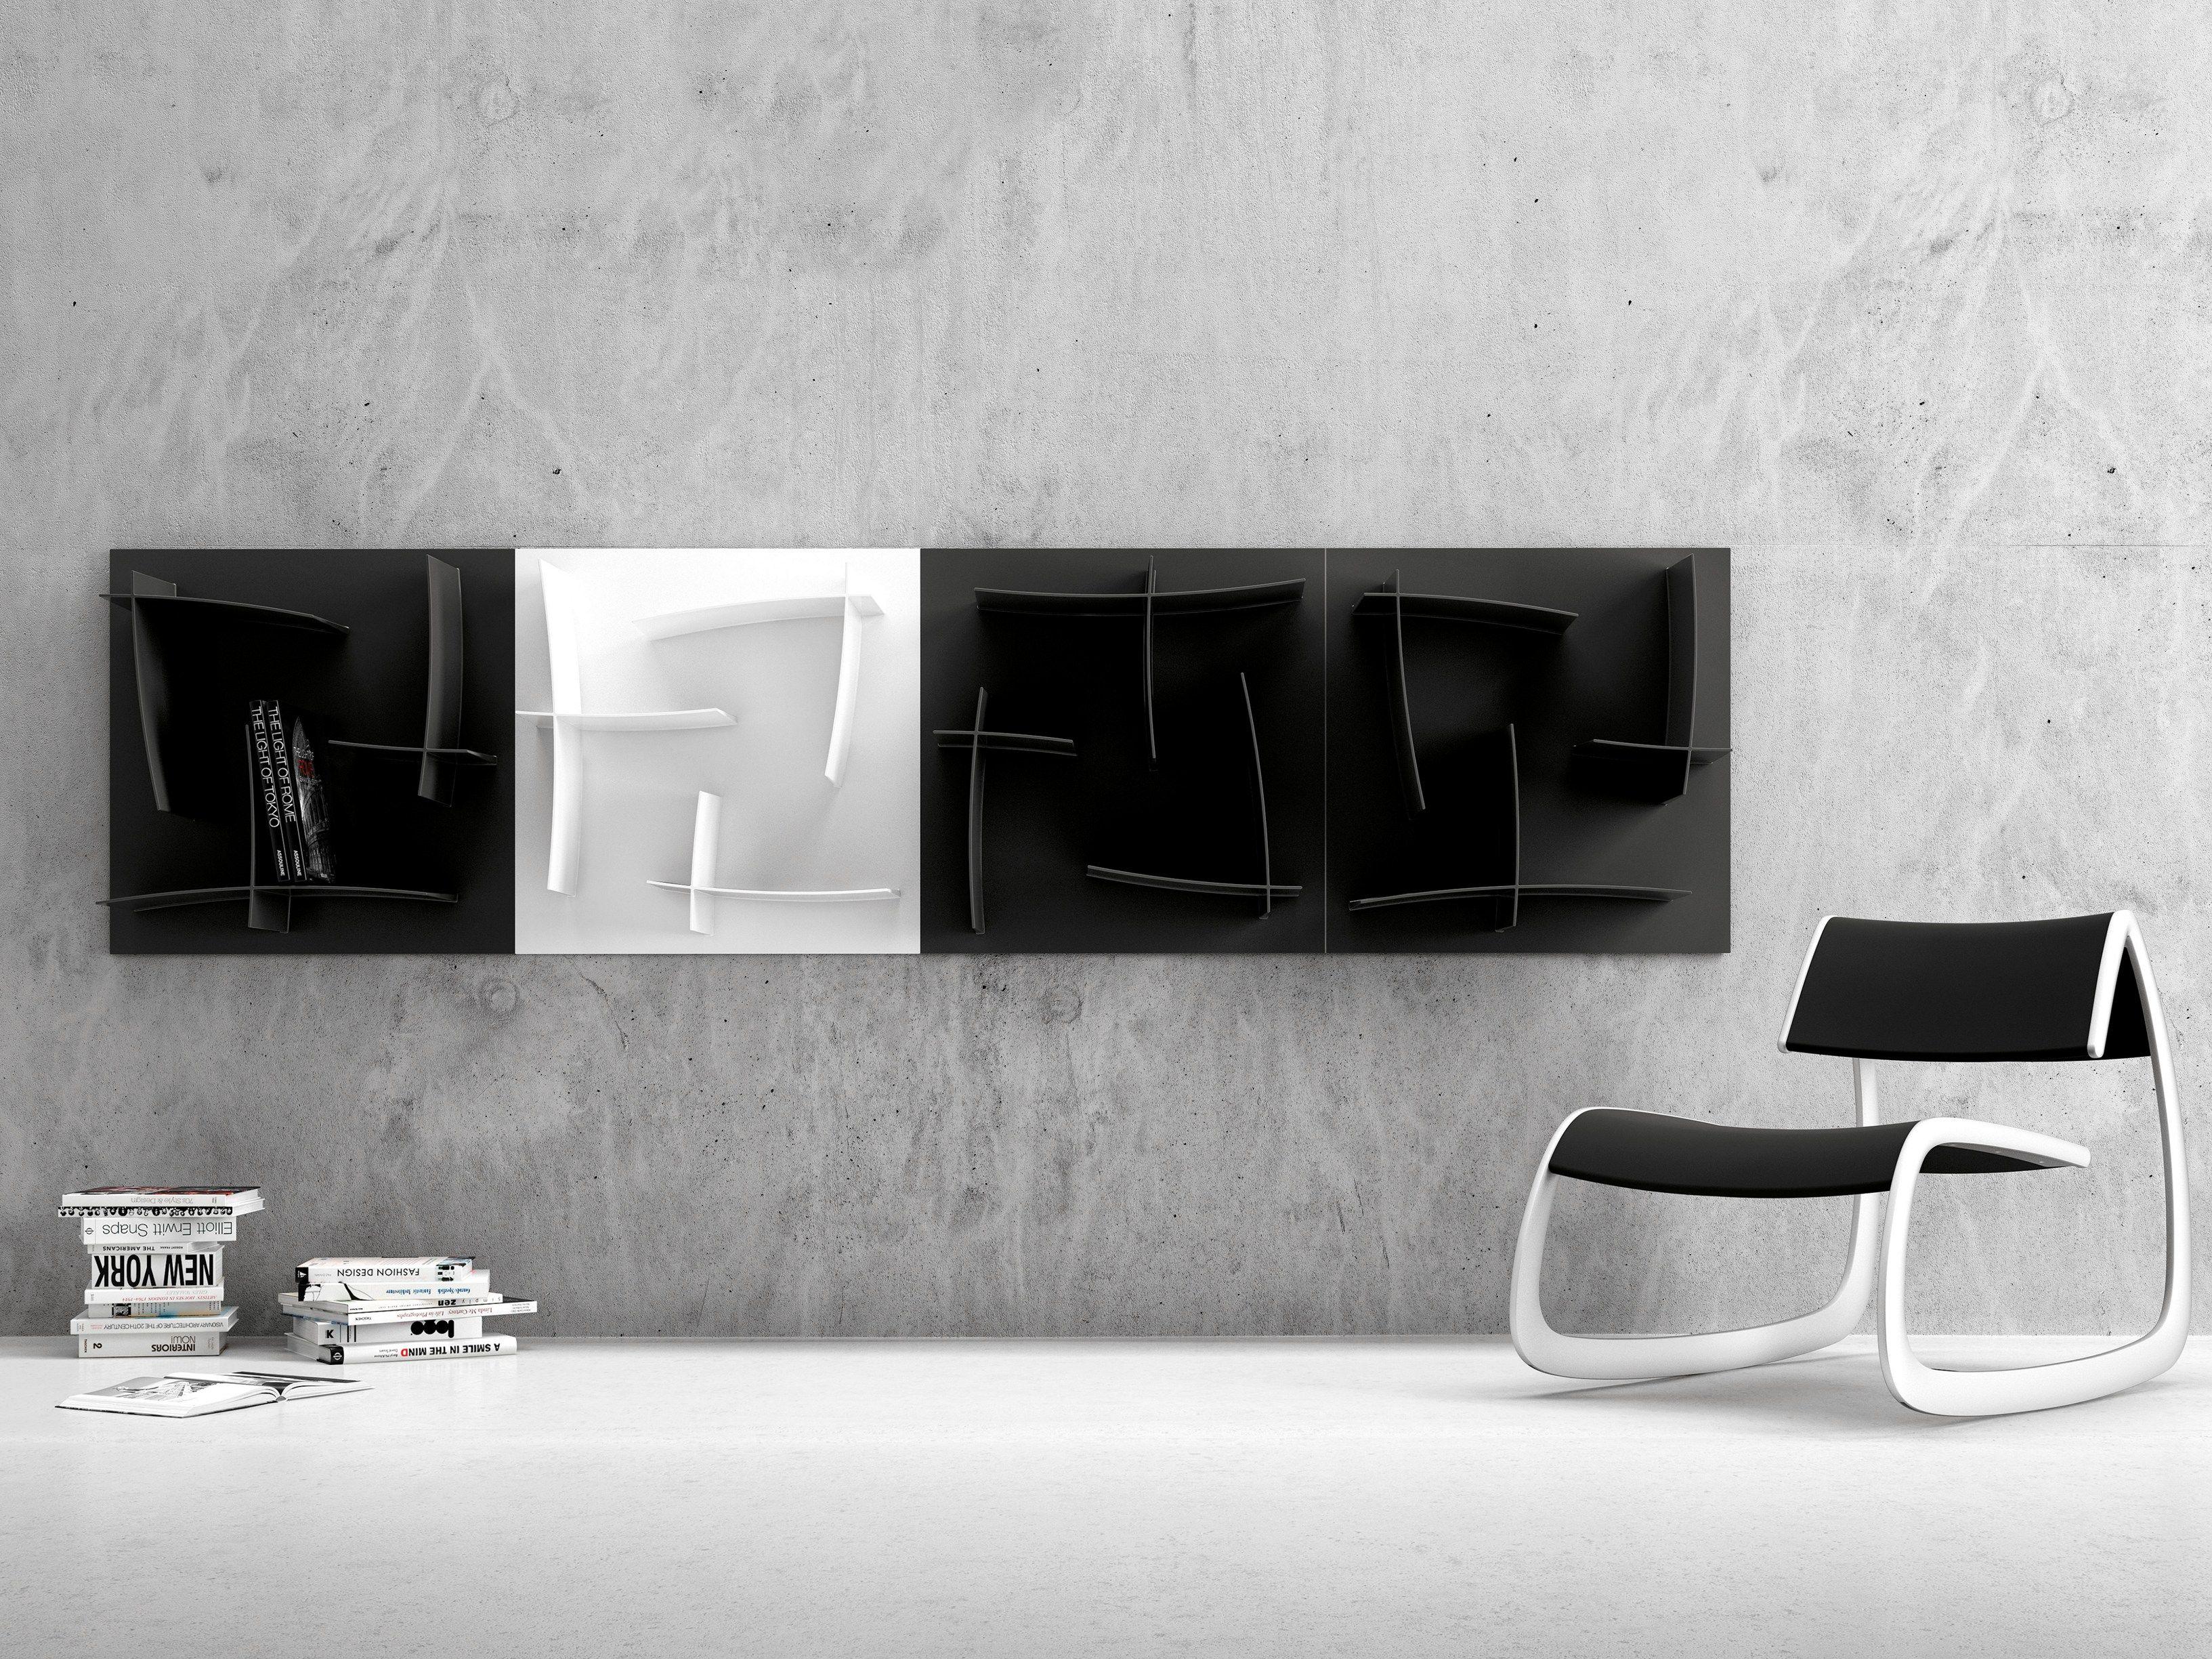 Pouf Poggiapiedi Girevole Beetle Infiniti Design : Libreria a parete modulare arigatÒ infiniti by omp group